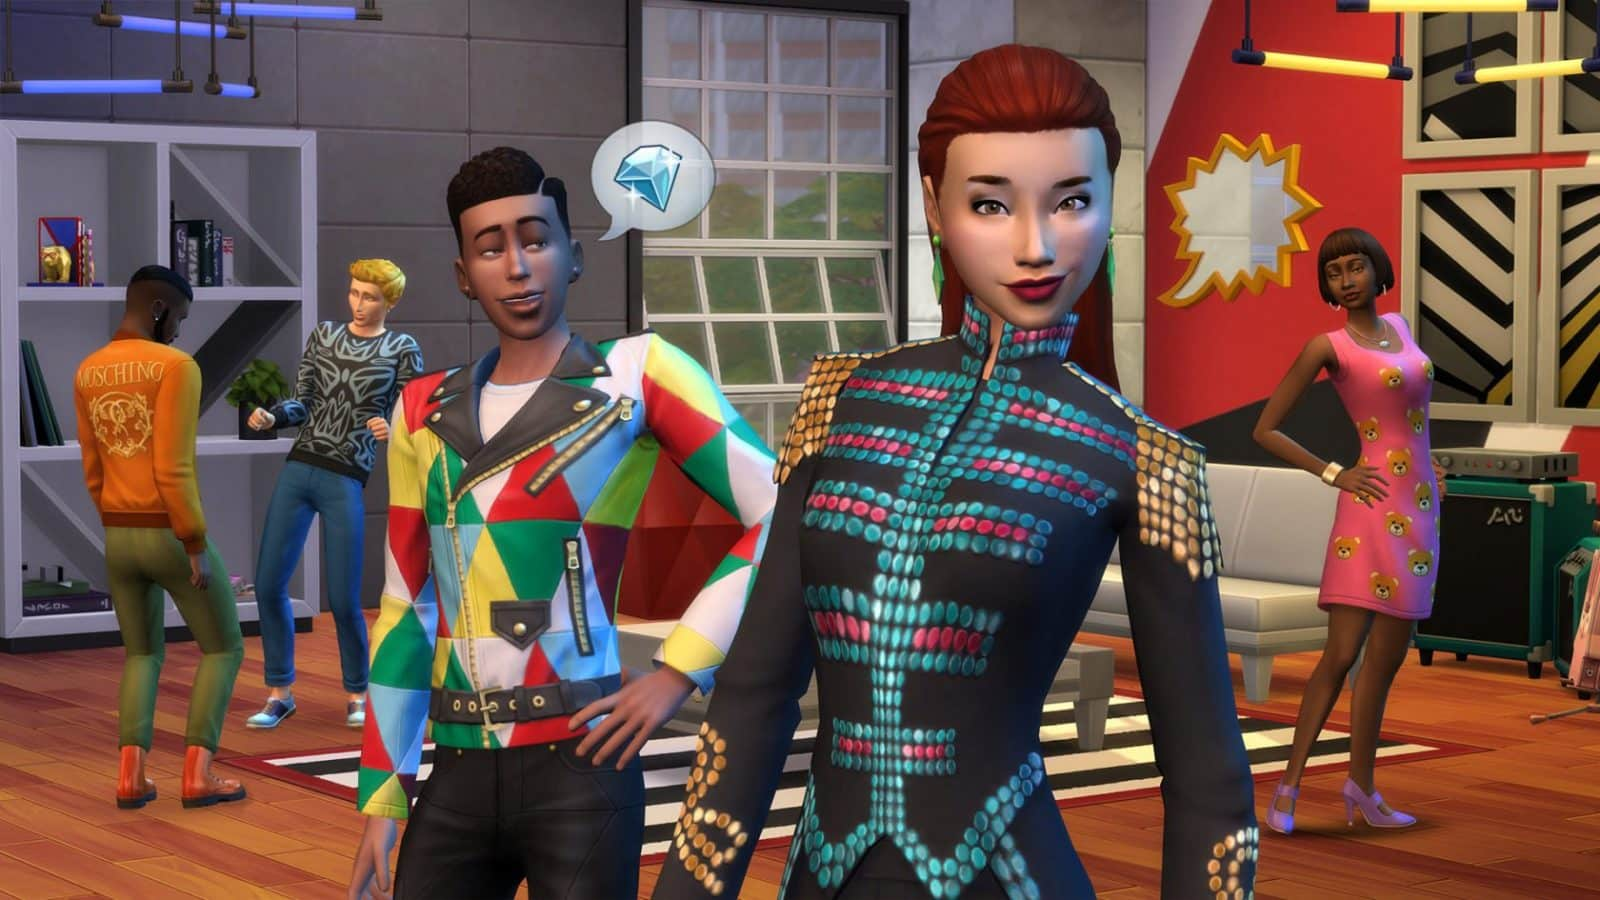 Die Sims 4: Moschino